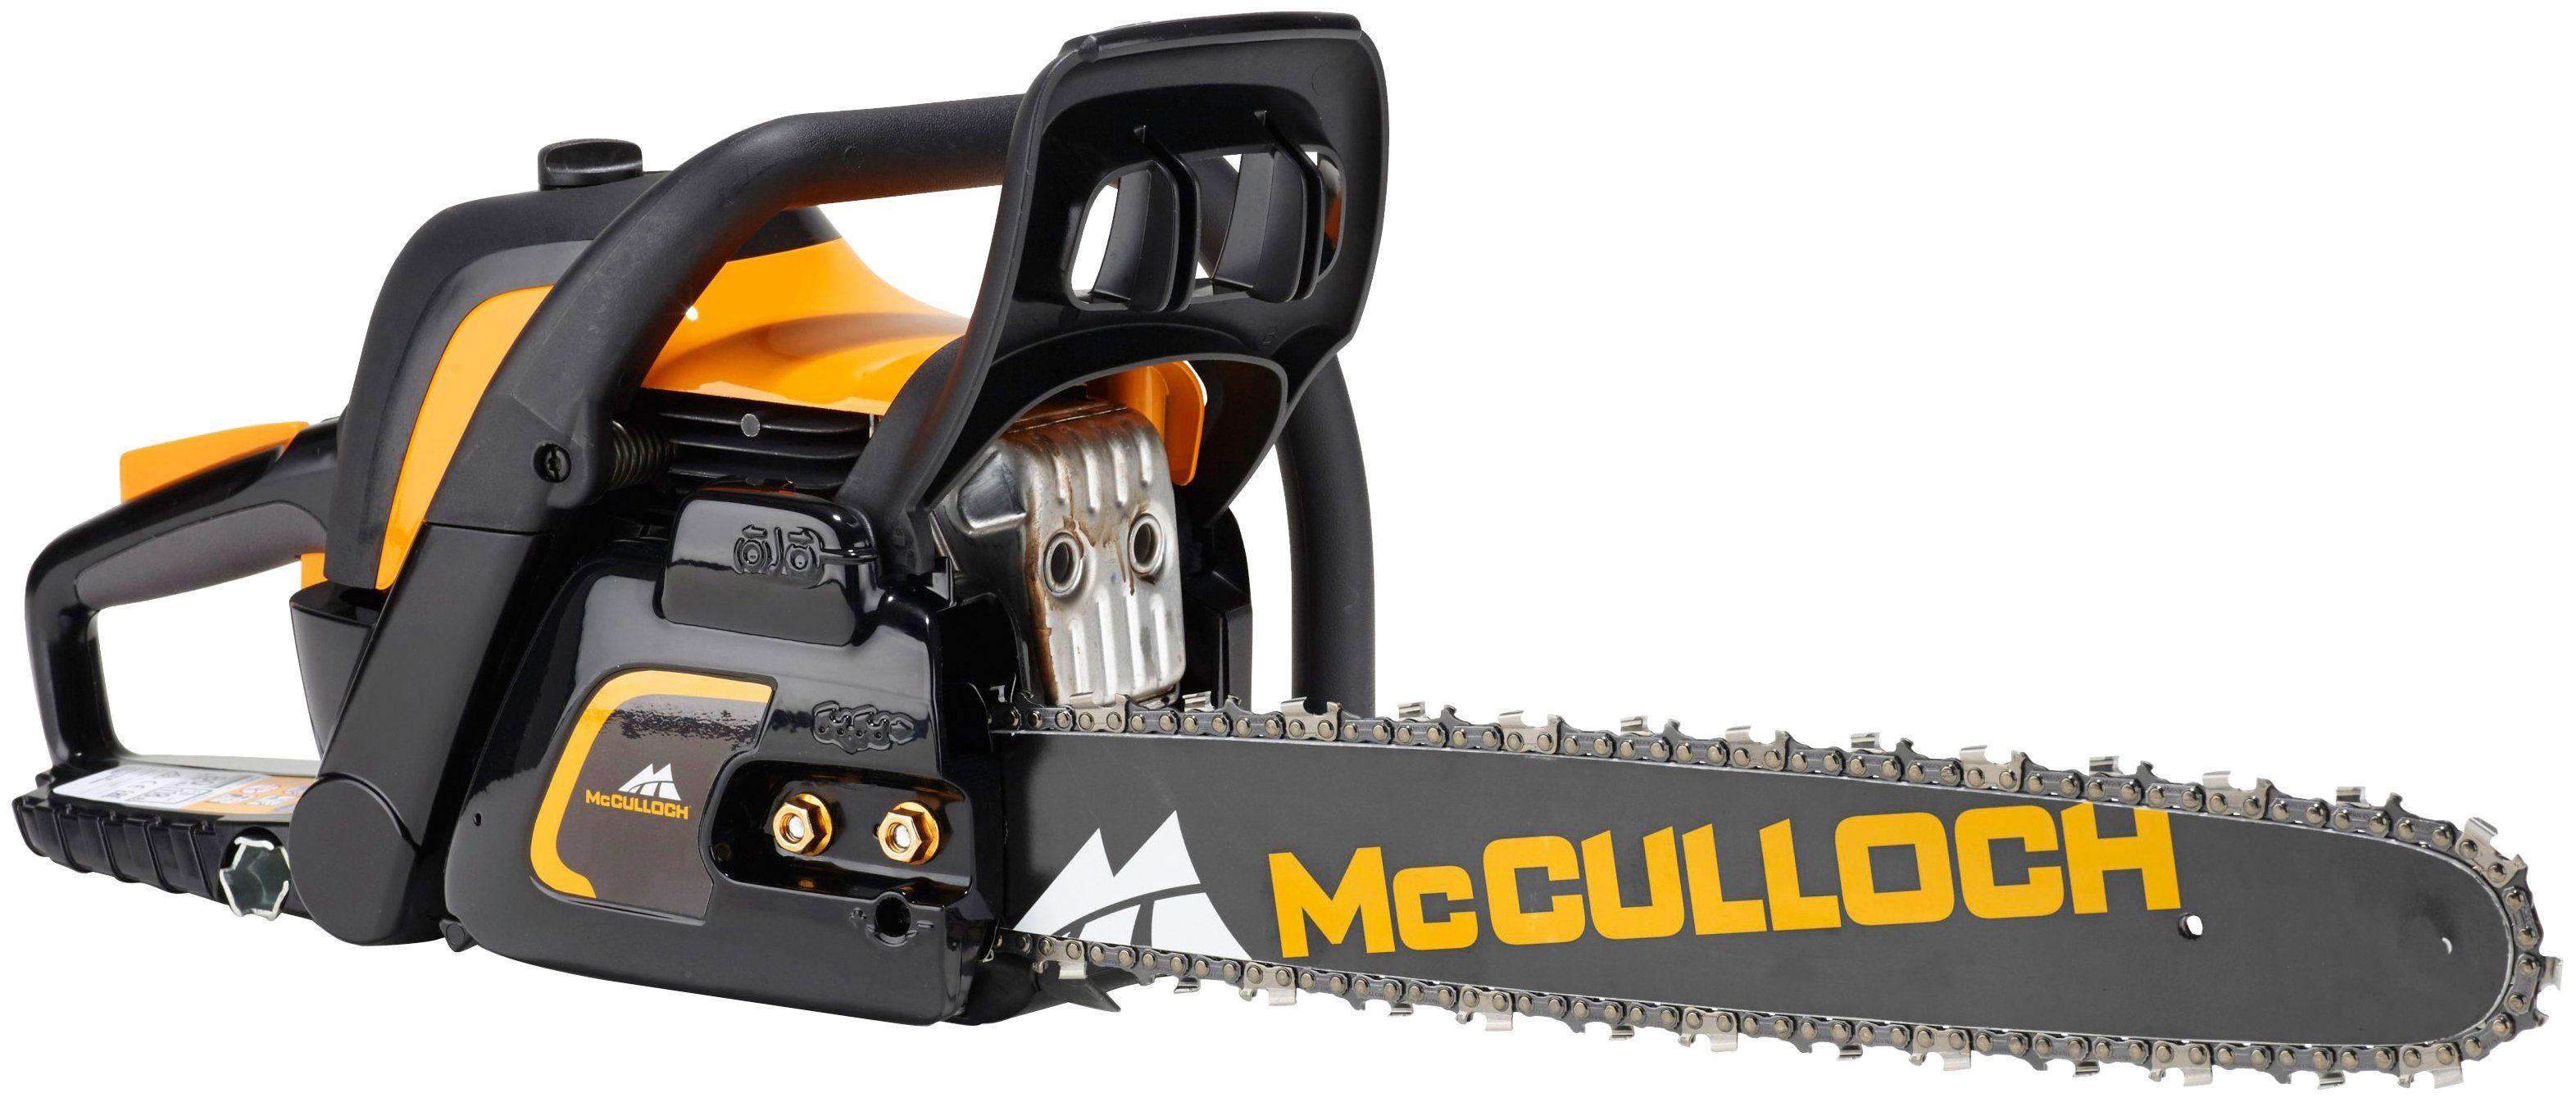 MCCULLOCH Benzin-Kettensäge »CS 50 S, 00096-73«, 45 cm Schwertlänge